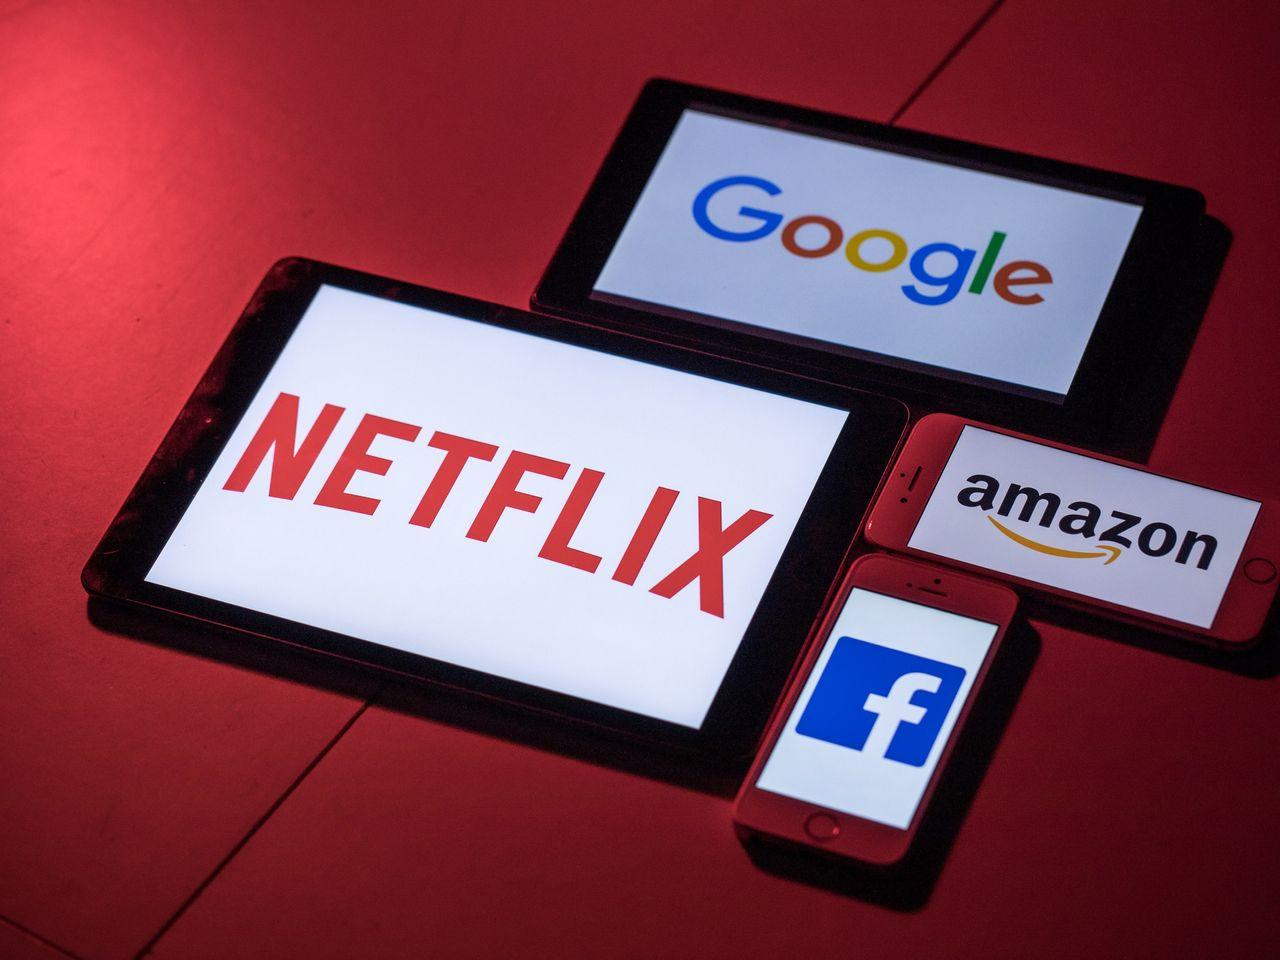 Минцифры спрогнозировало, как подорожают услуги техногигантов из-за налога на Google